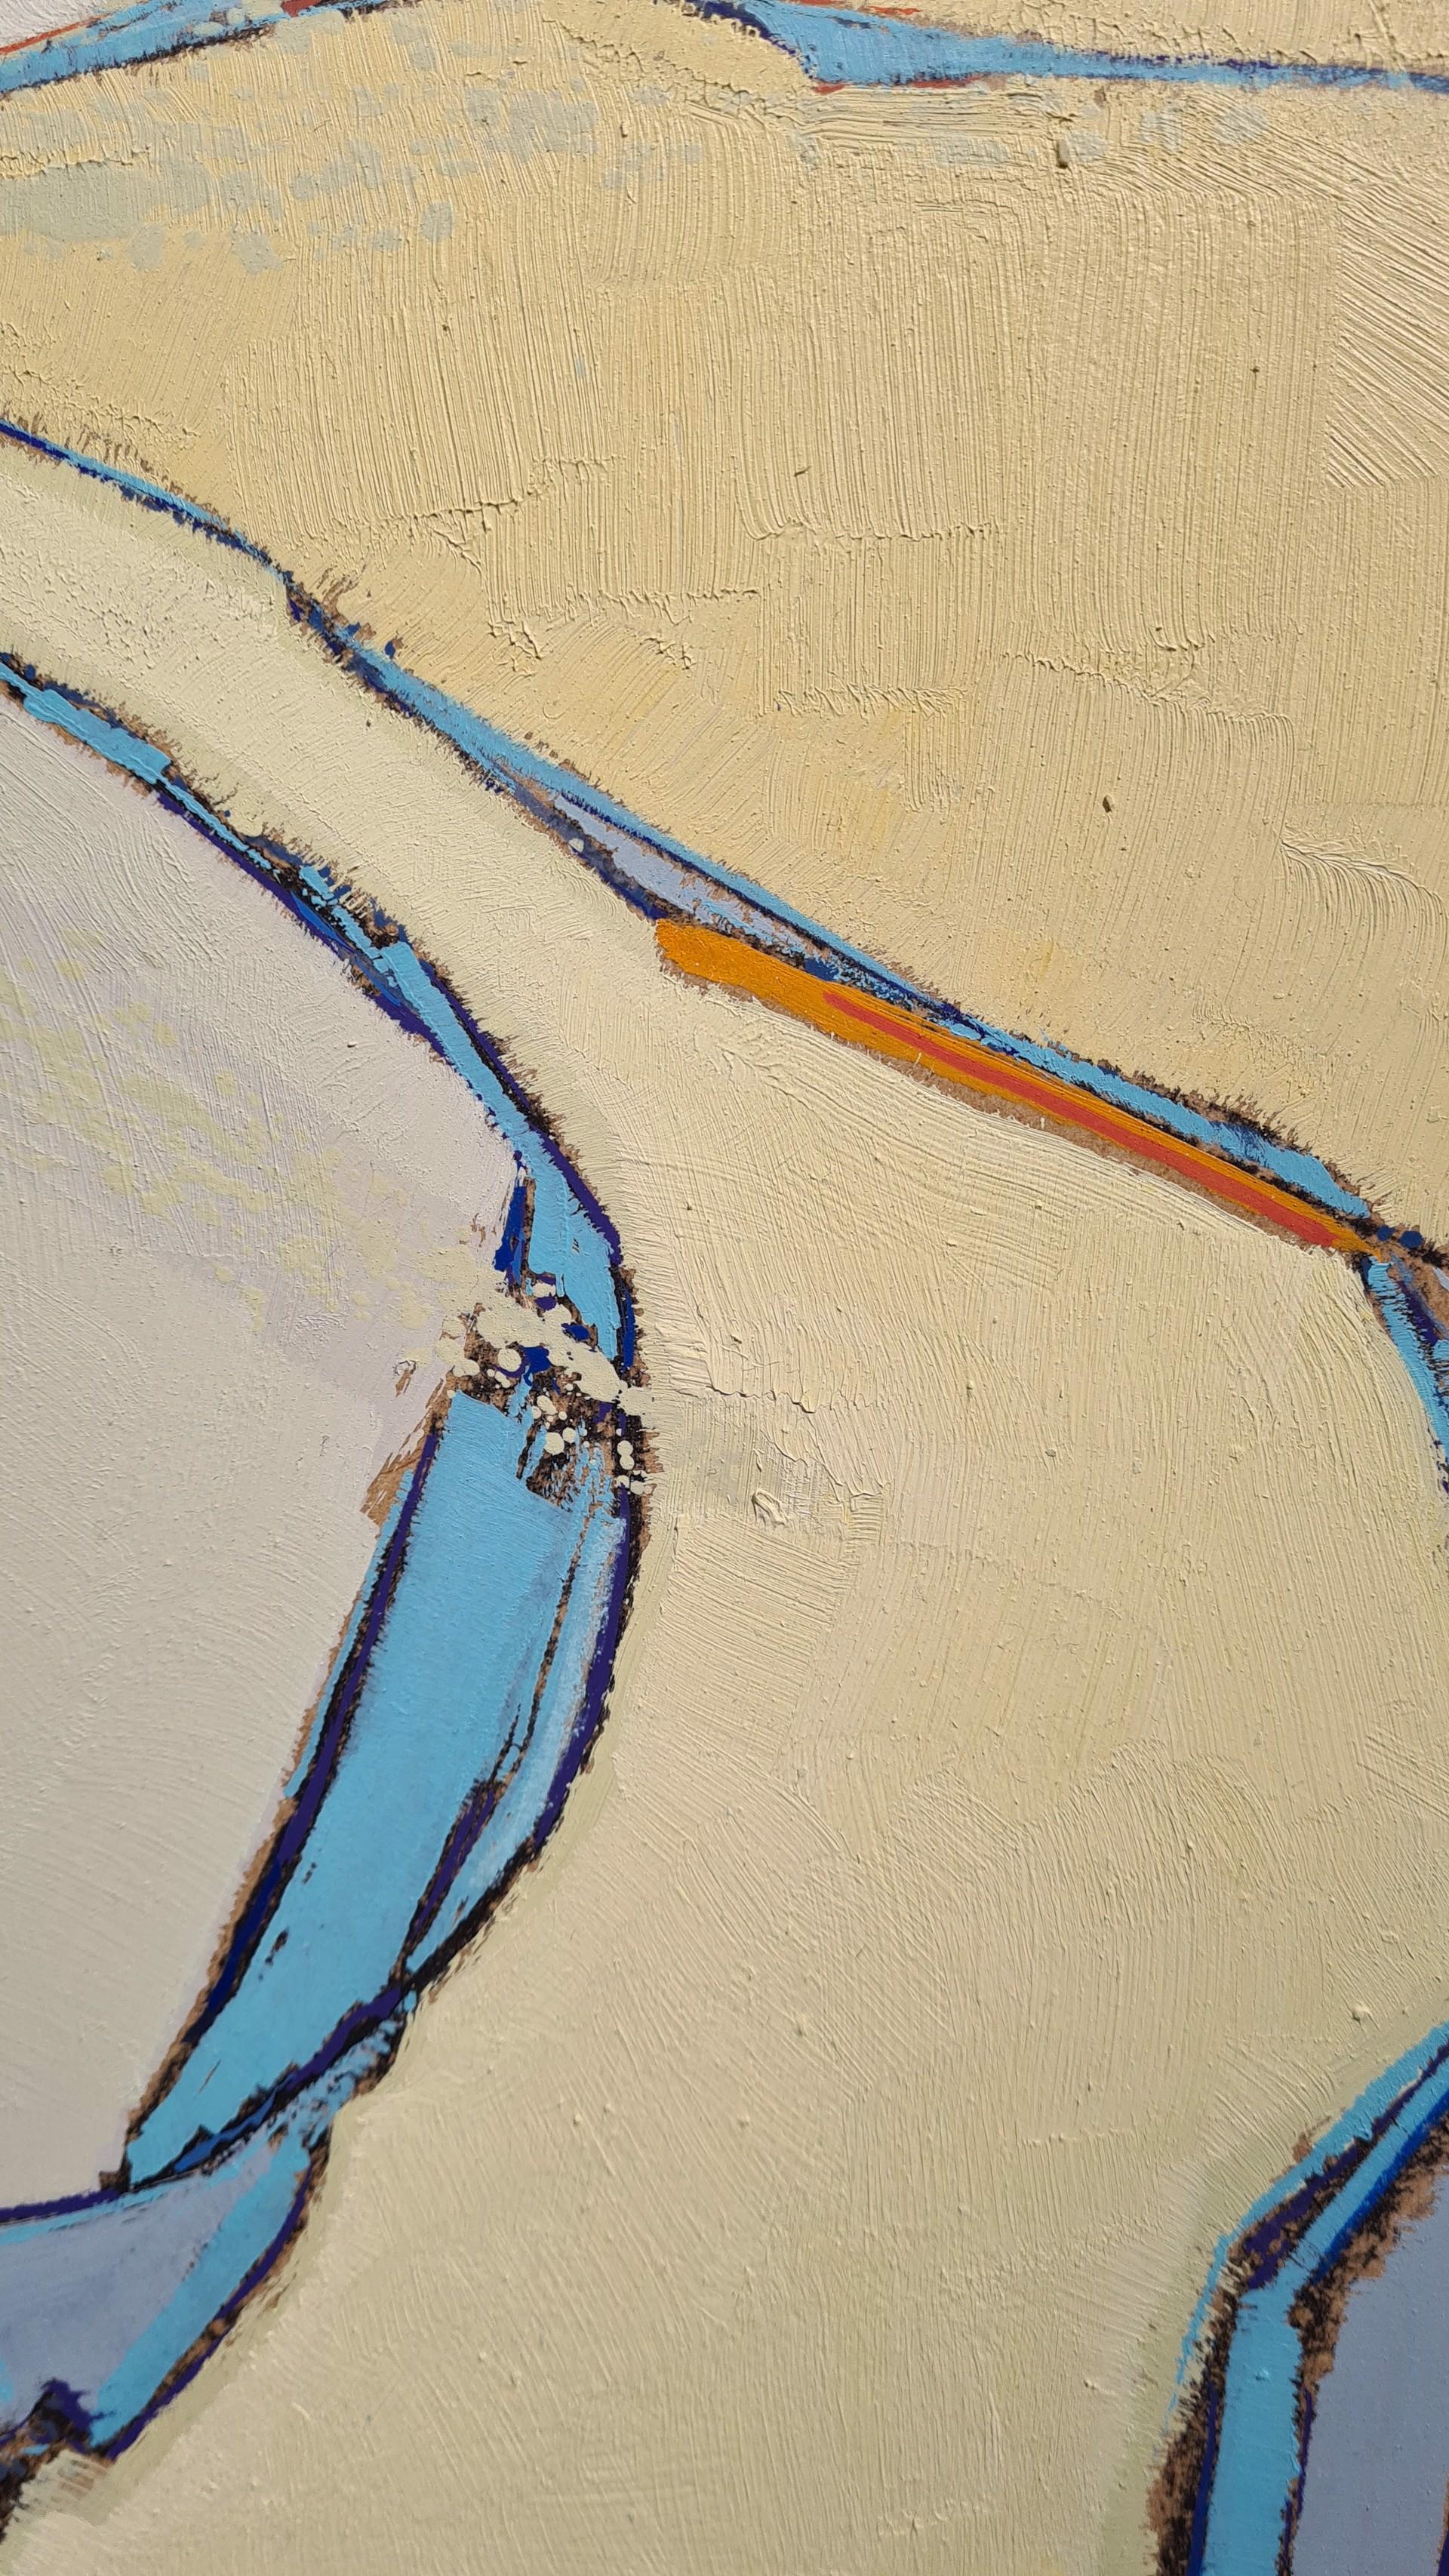 Ribbons of Blue Water, Holkam Beach, Norfolk by Daniel Cole